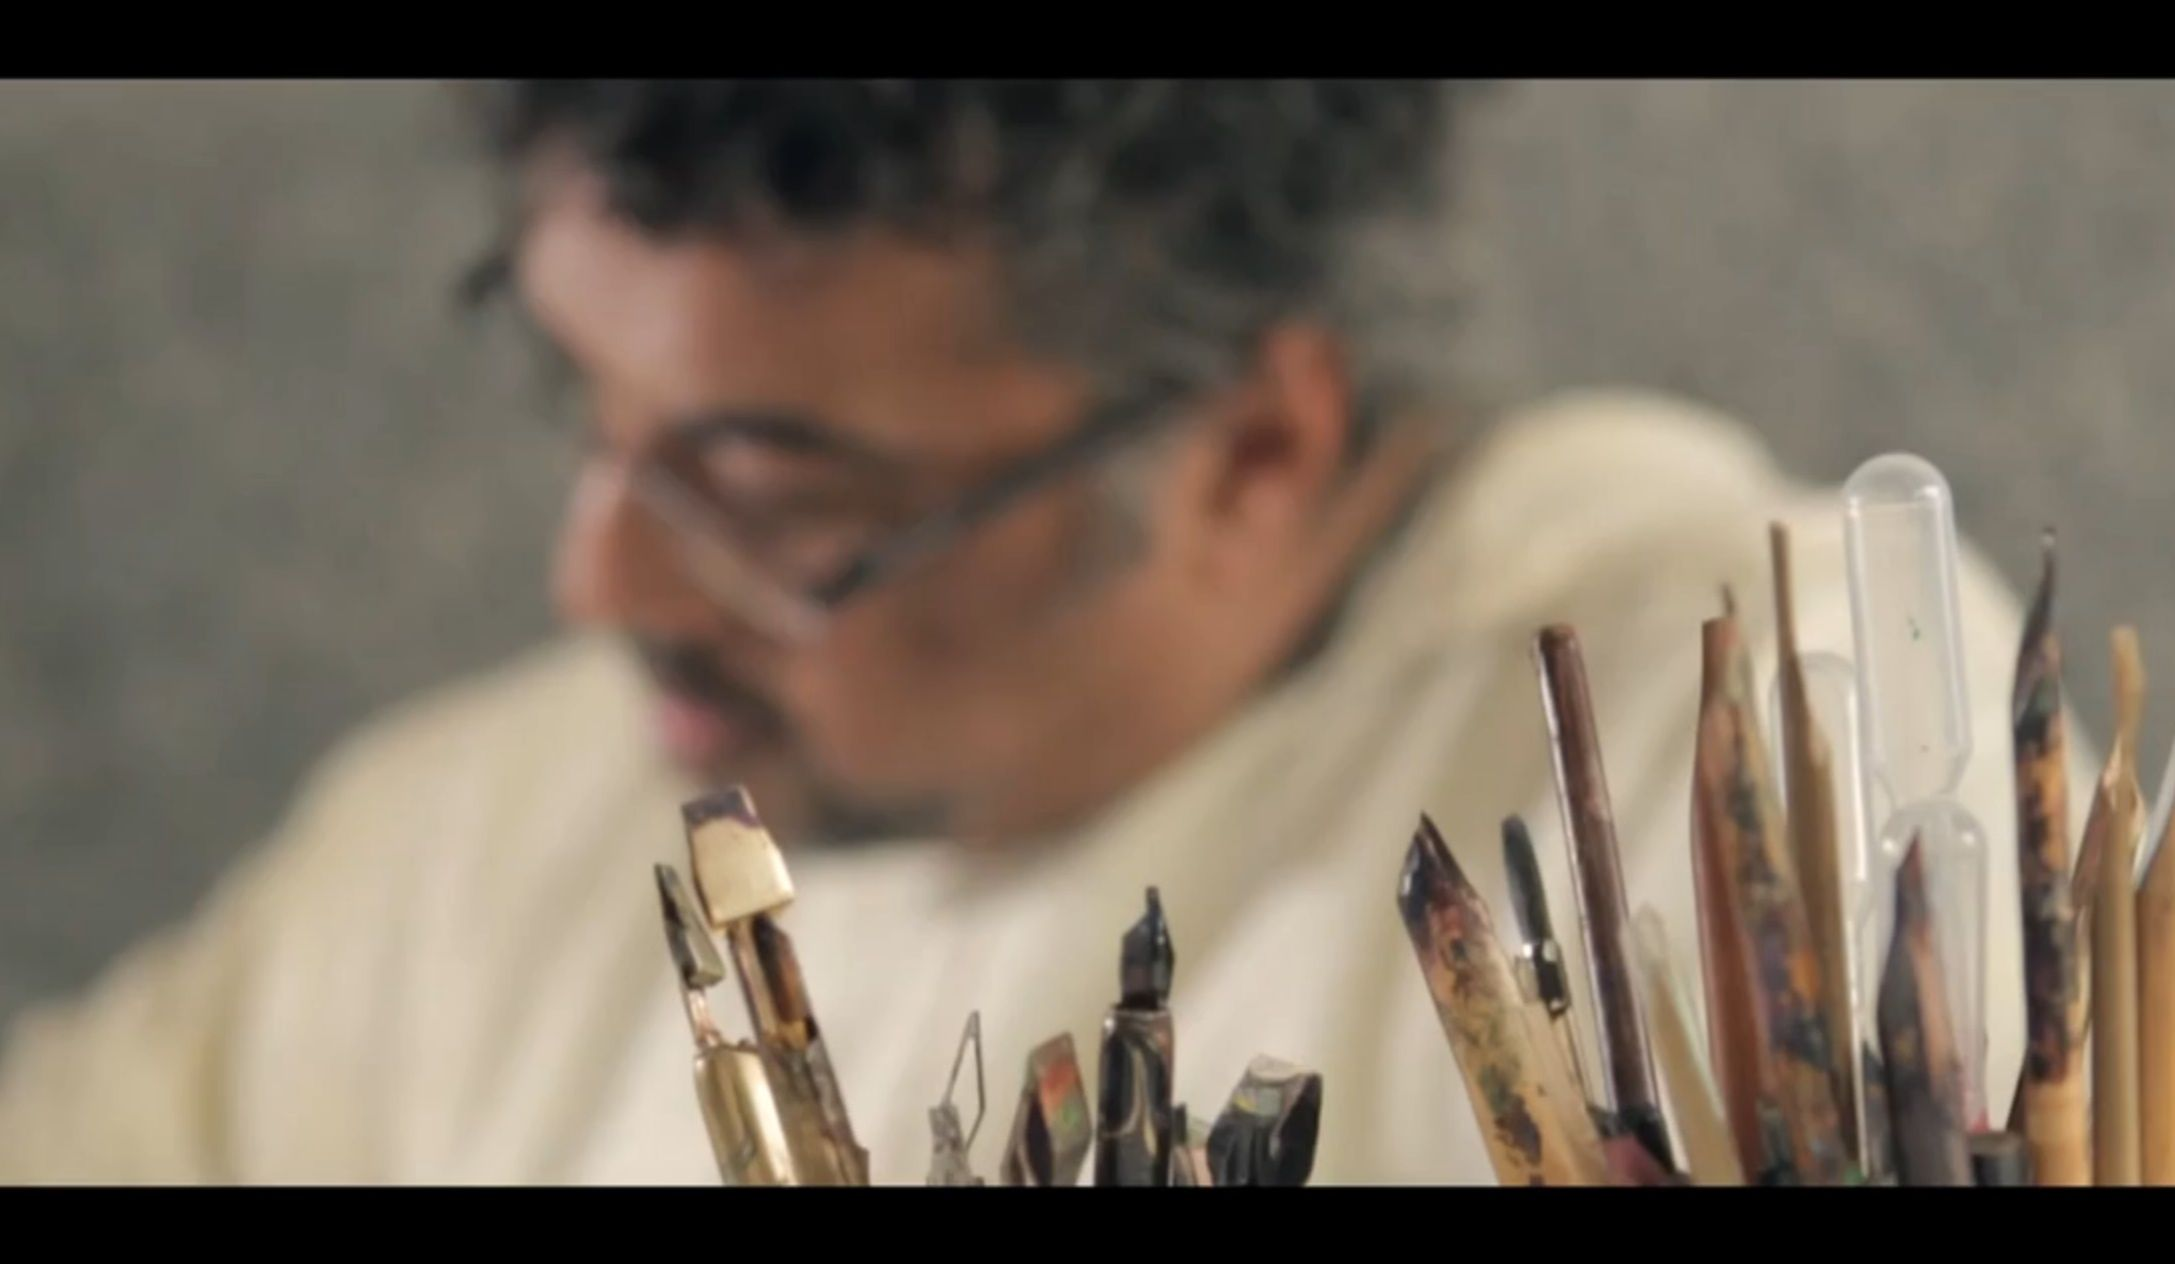 Samir and calligraphy pens